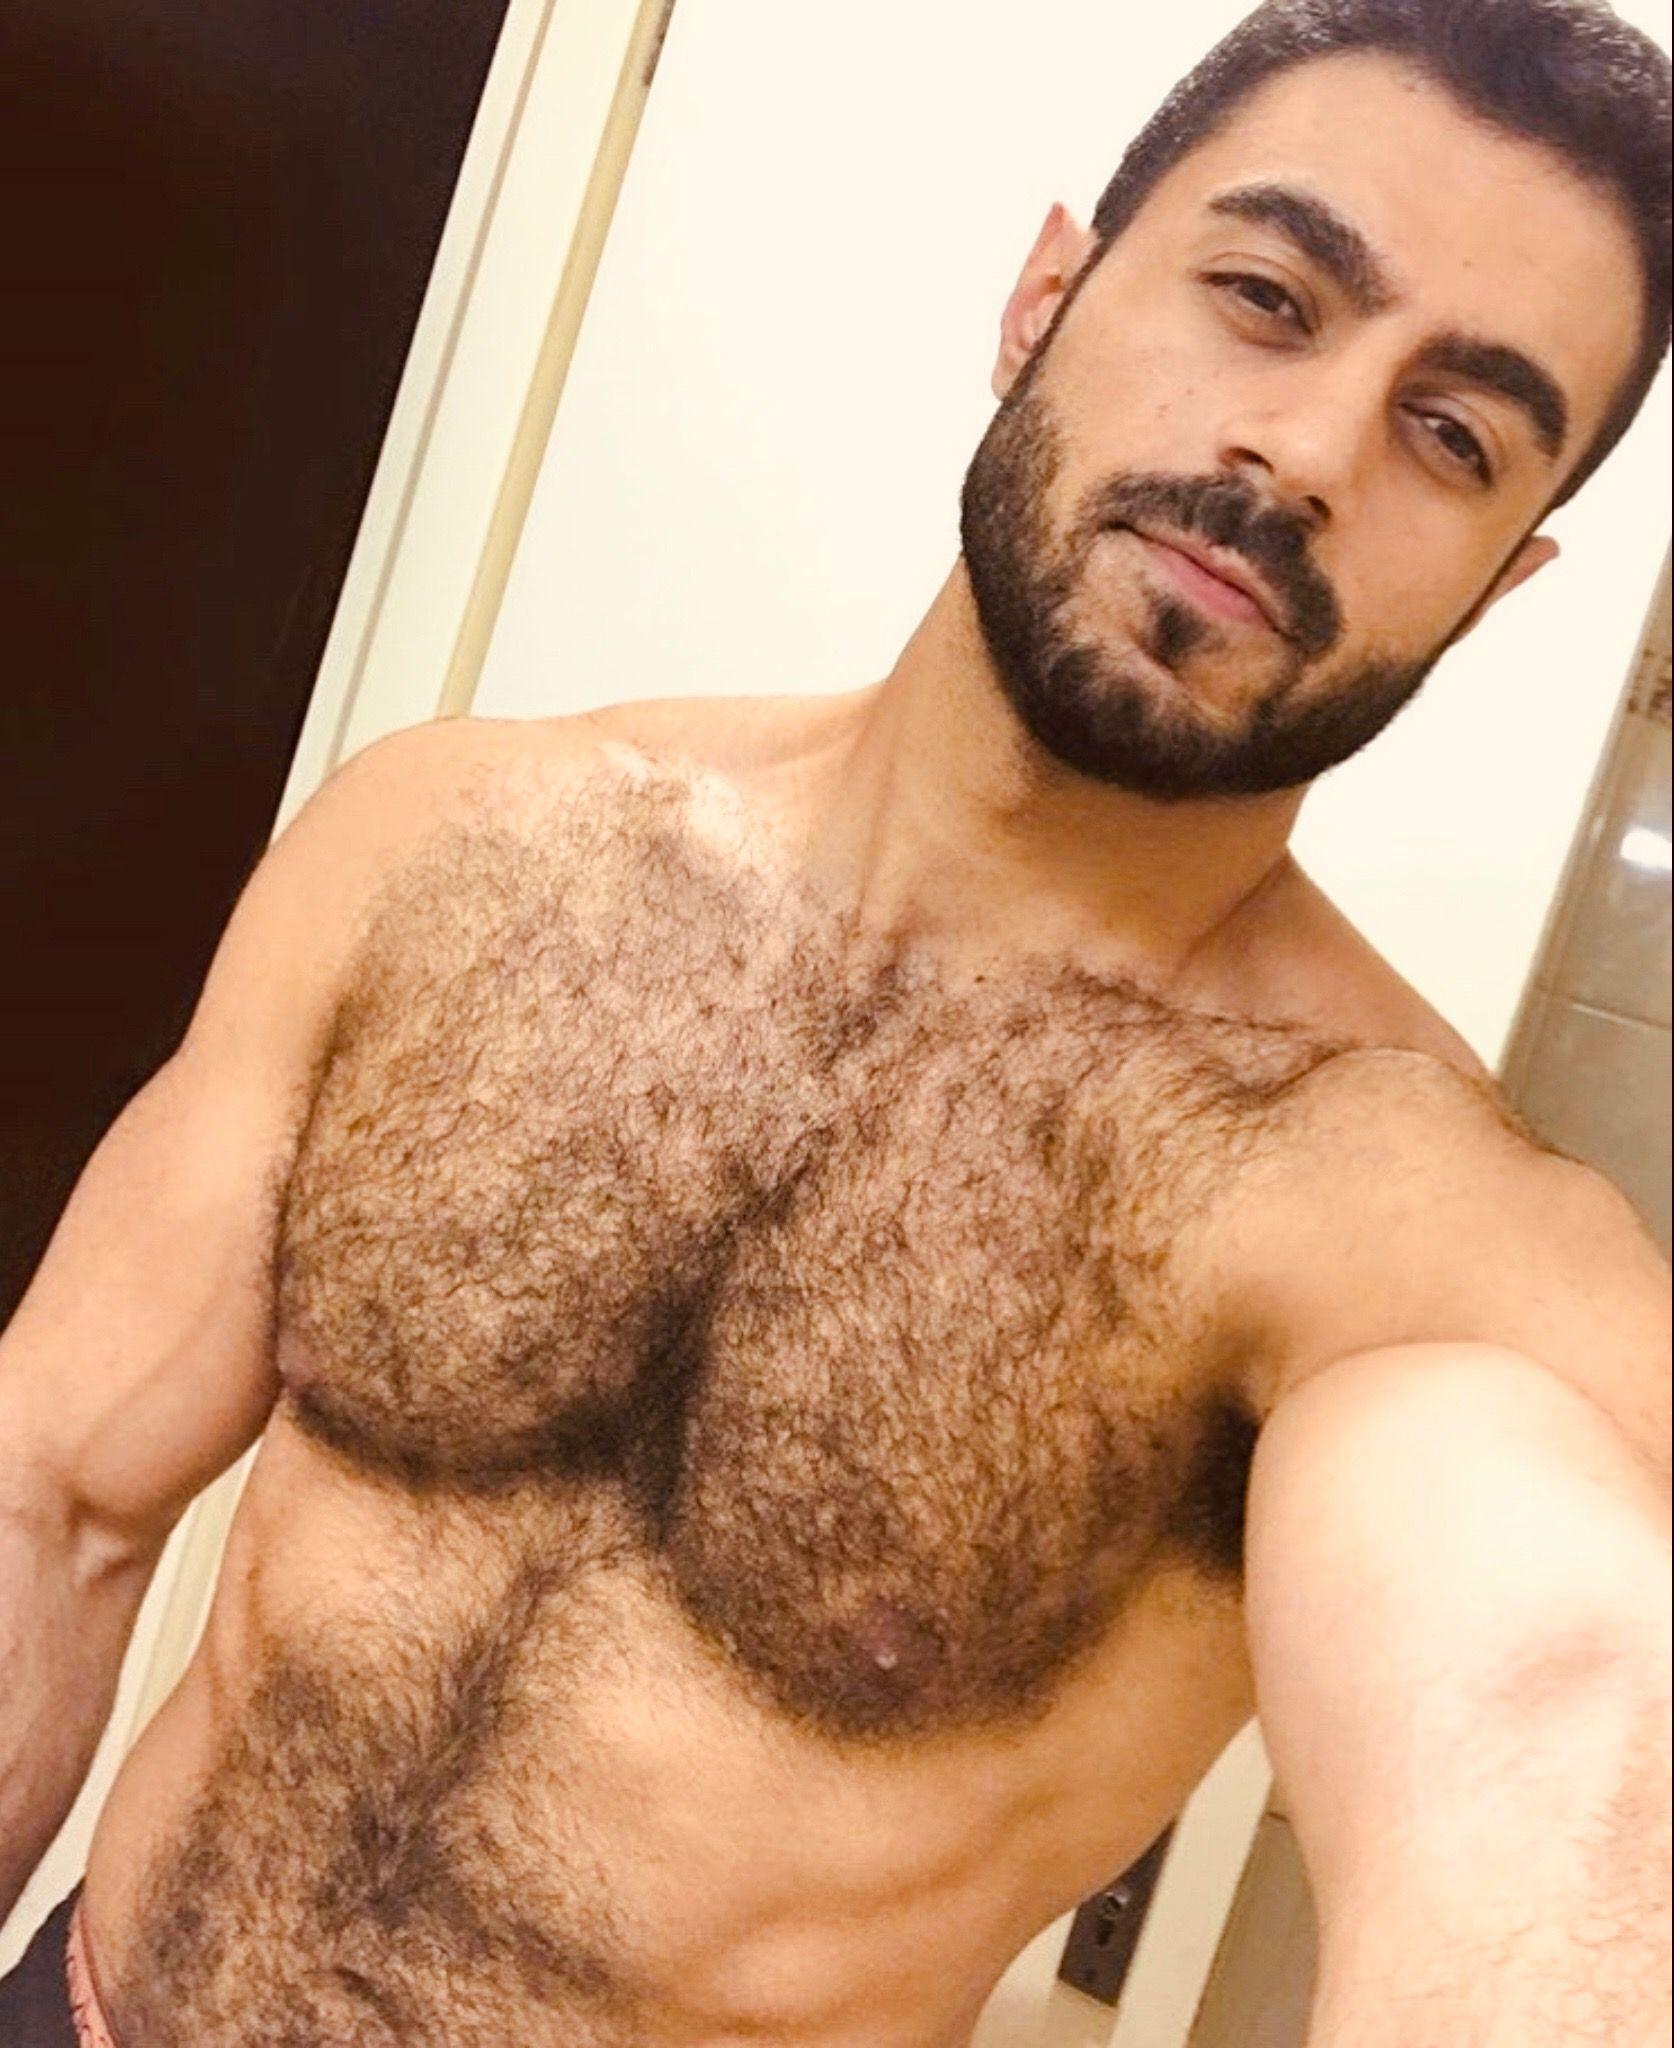 Amateur man bear